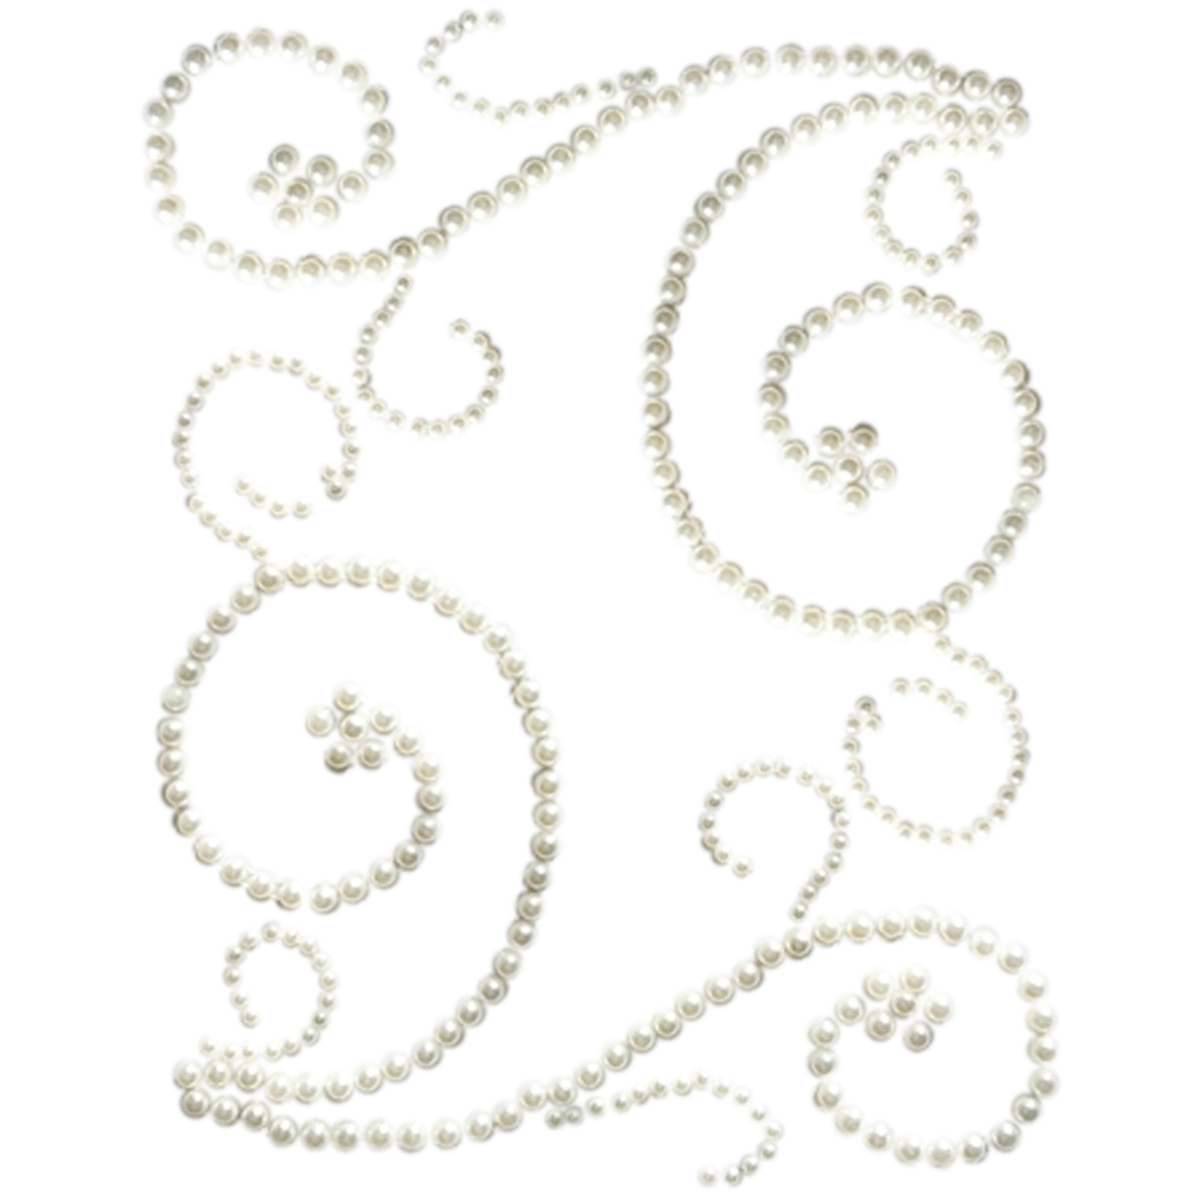 Want2Scrap Self-Adhesive Swirls Bling-White Pearls